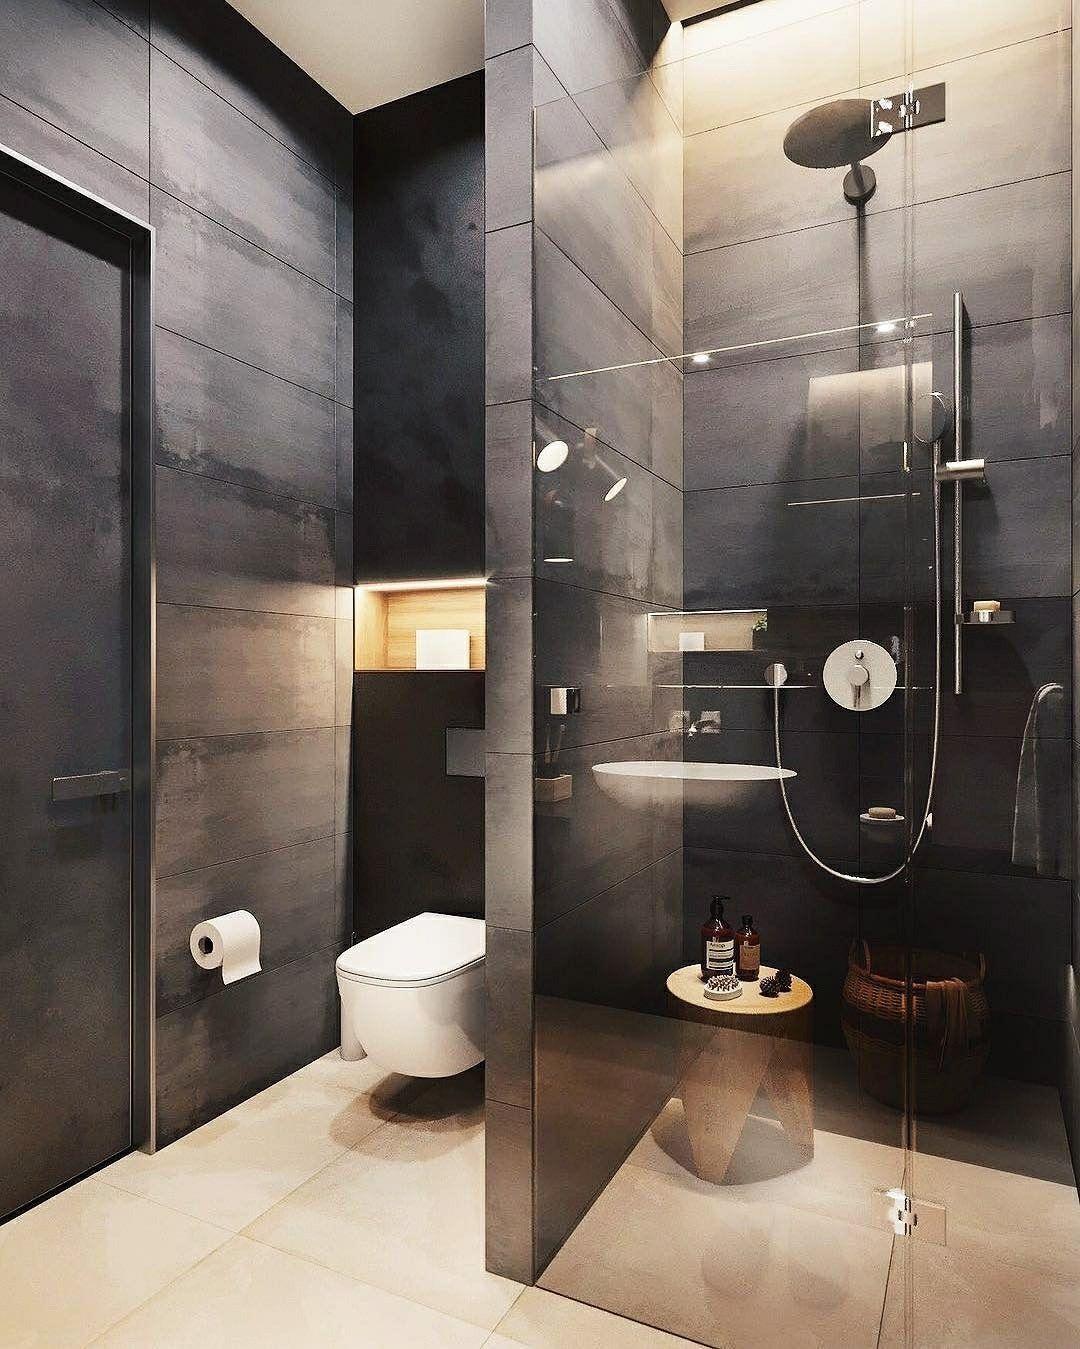 Bathroom Inspiration Mirrorr Studio The Perfect Scandinavian Style Home Modern Bathroom Bathroom Design Small Master Bathroom Design